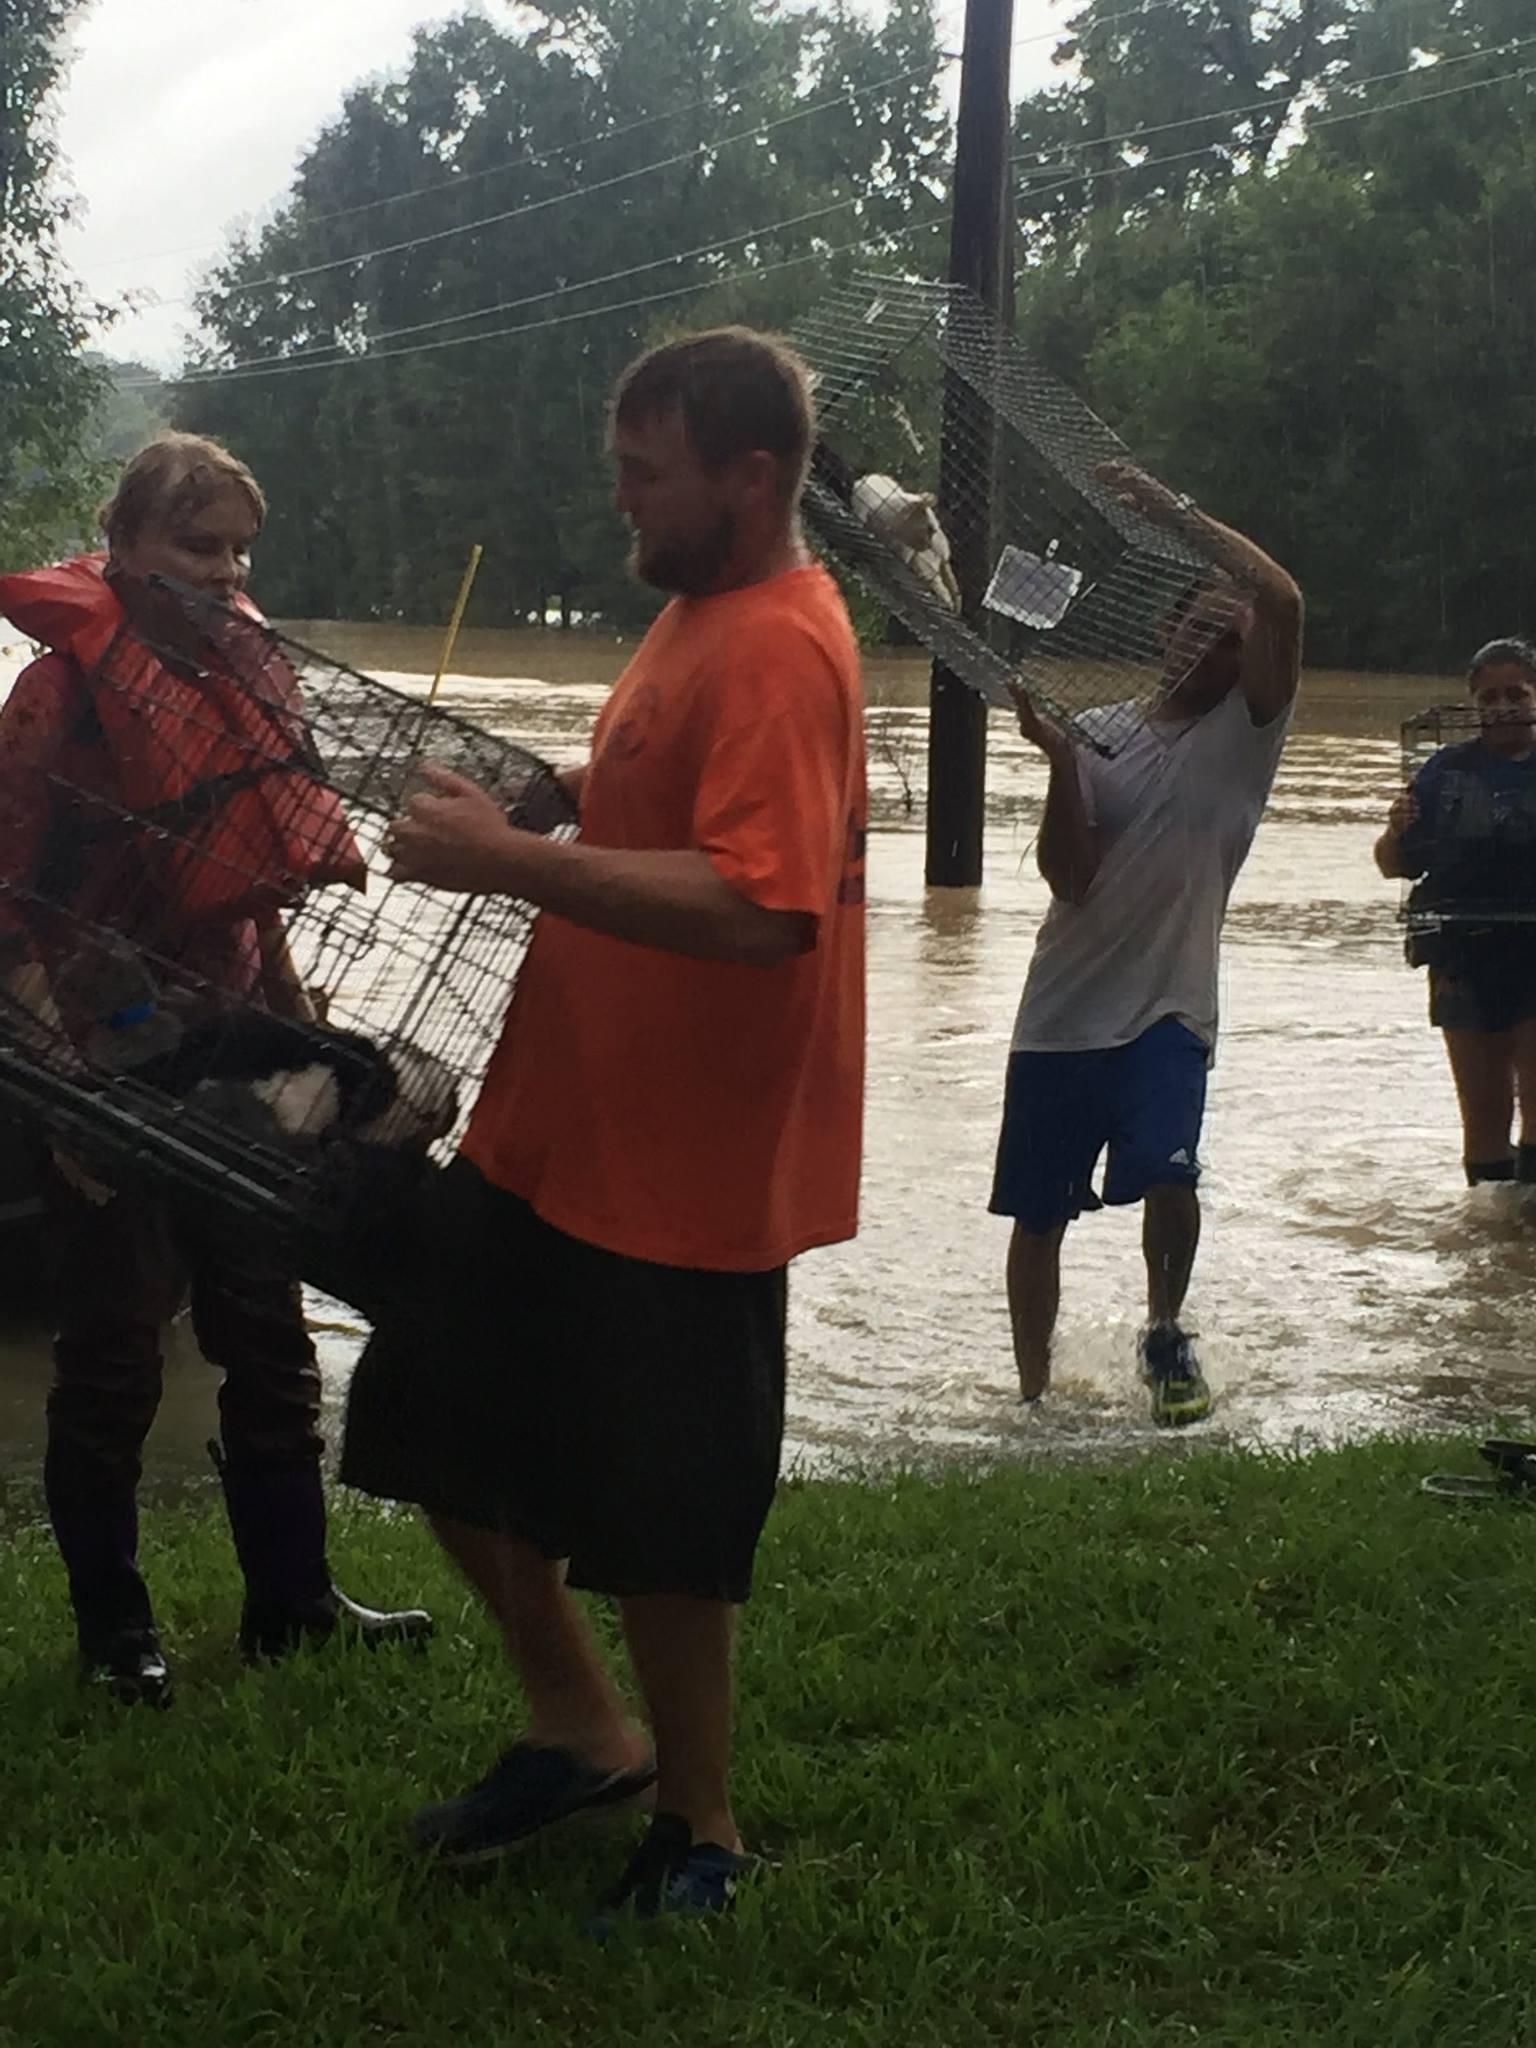 Louisiana Flood Update 13920512_1070483856369074_7001050384956947777_o